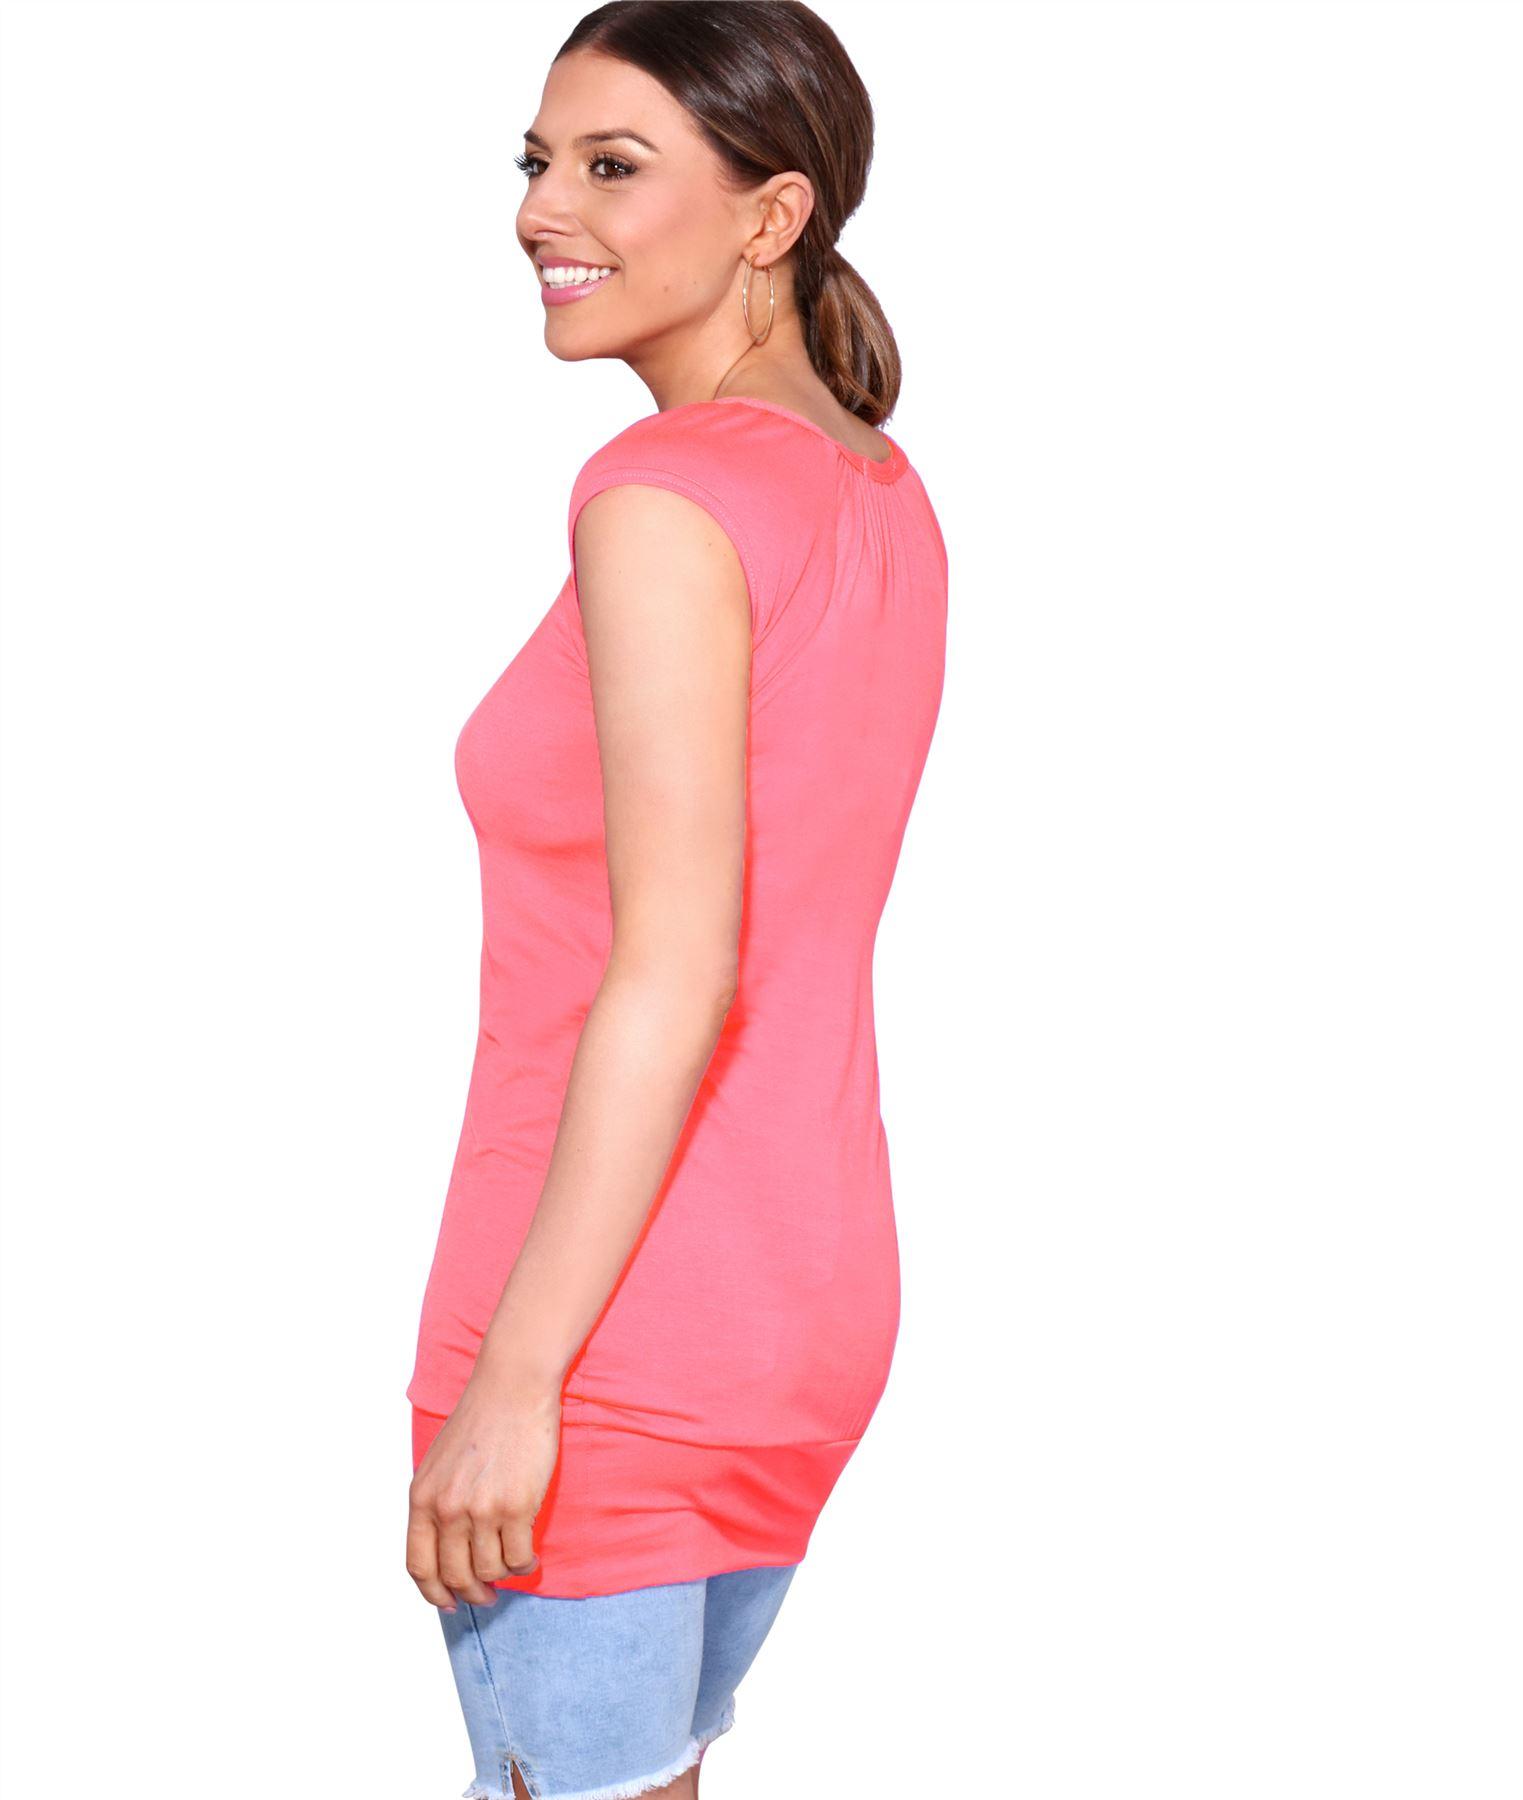 Womens-Ladies-Scoop-Neck-Blouse-V-T-Shirt-Long-Short-Sleeve-Plain-Loose-Top thumbnail 18